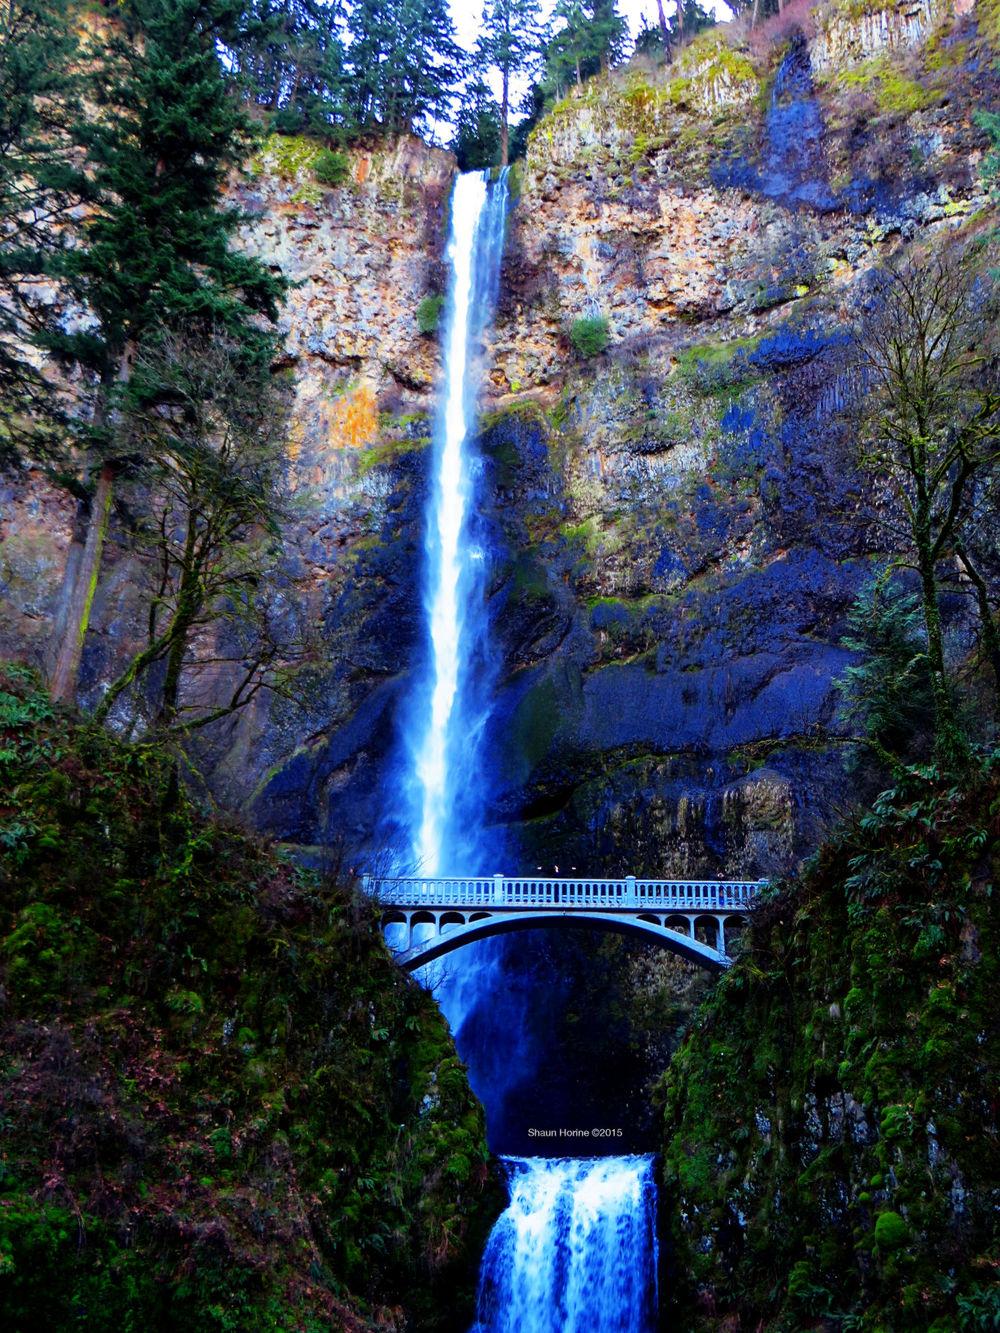 Multnomah Falls. March 1st, 2015